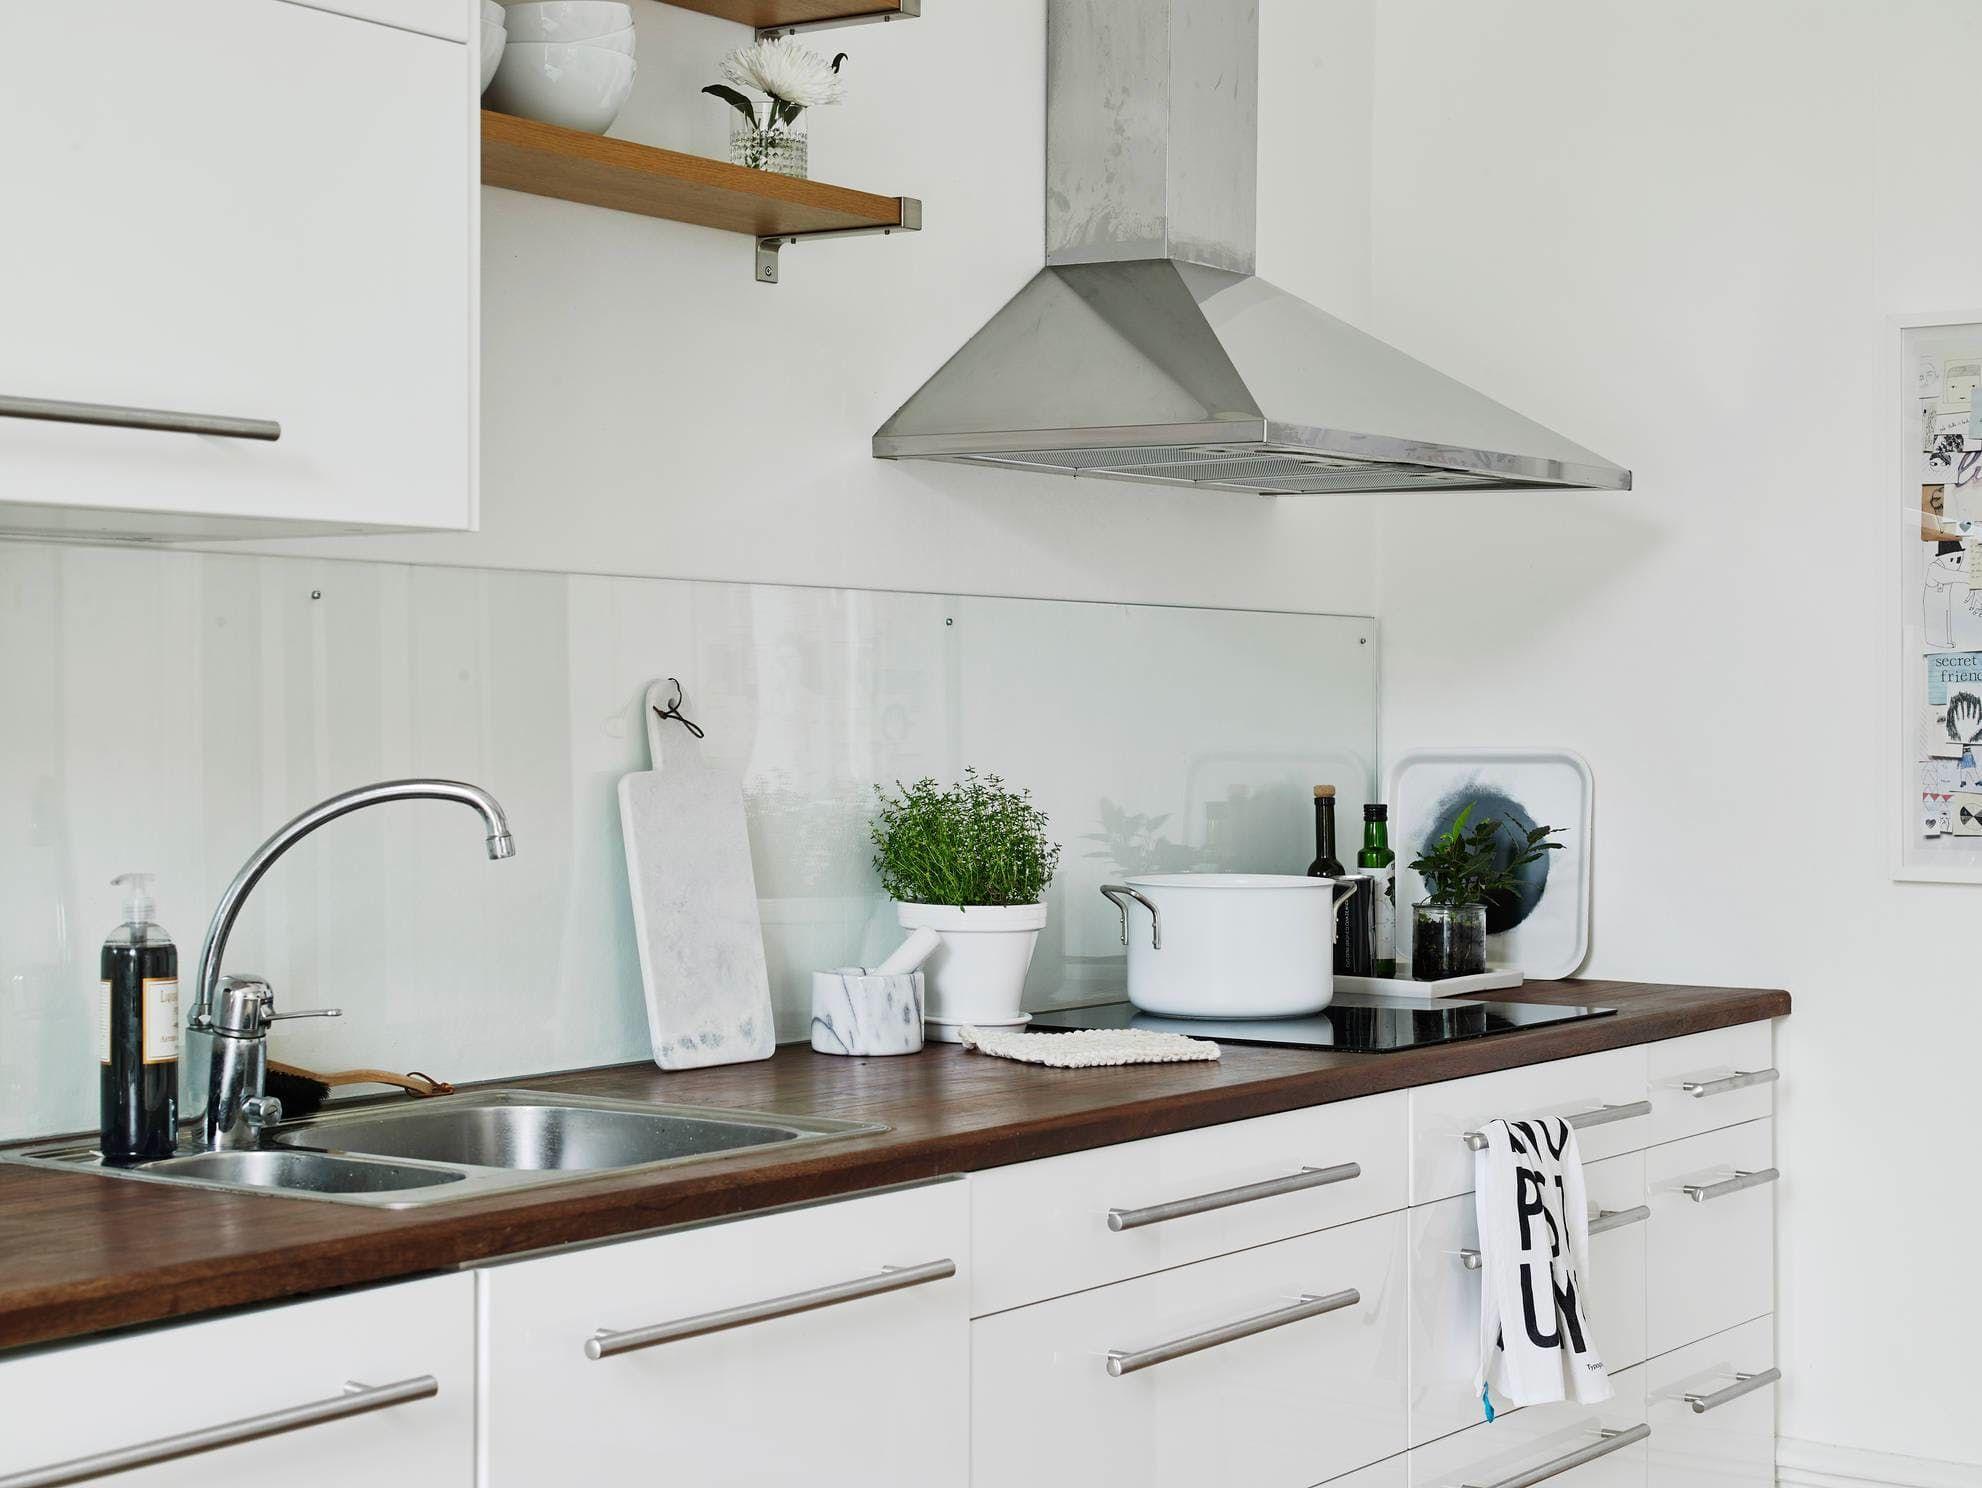 A Lovely, Low-Maintenance Alternative to Tile Backsplashes